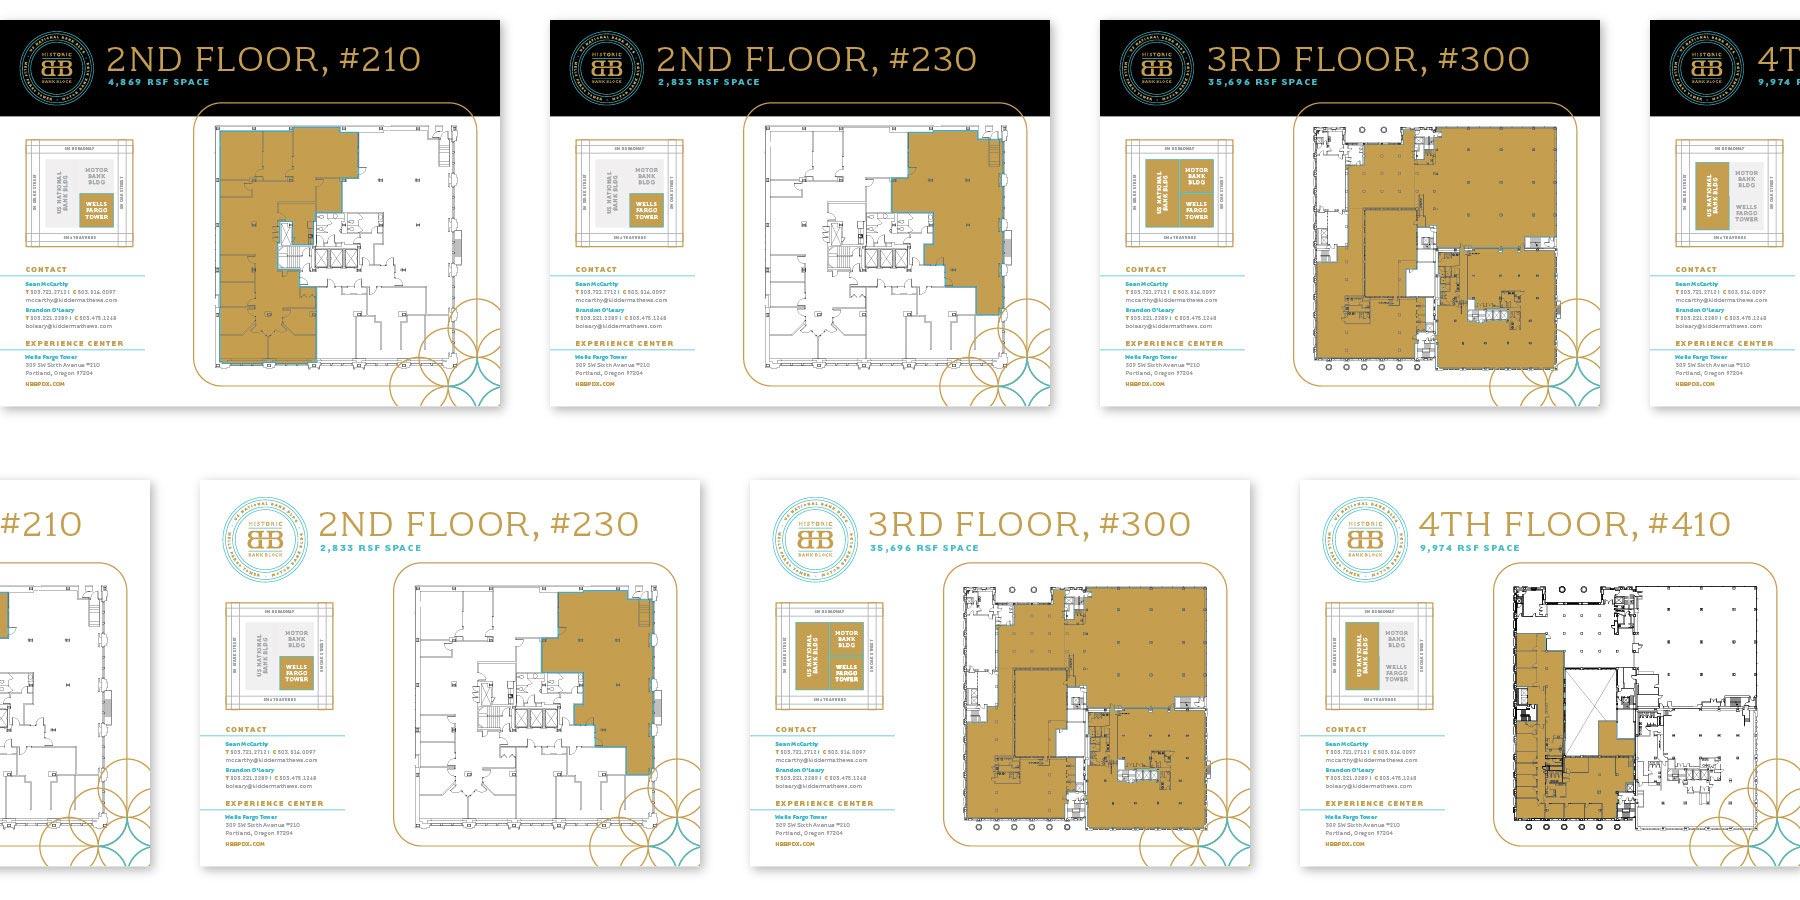 HBB-Floorplans.jpg